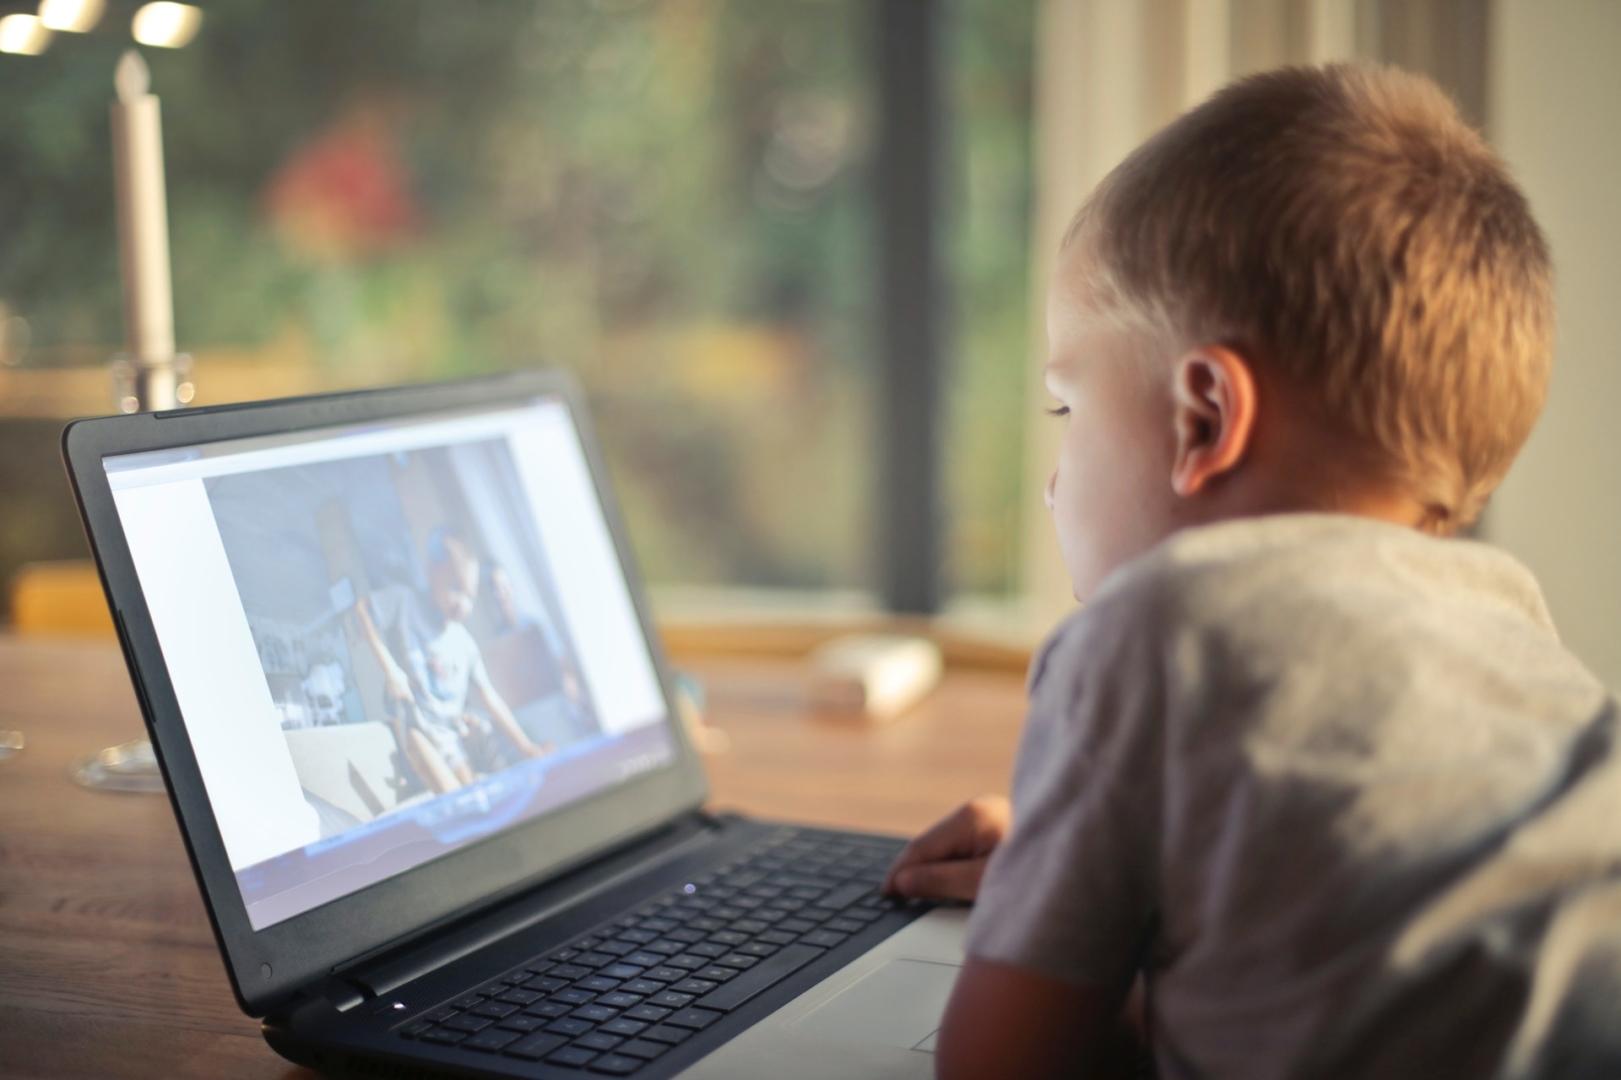 boy-child-laptop